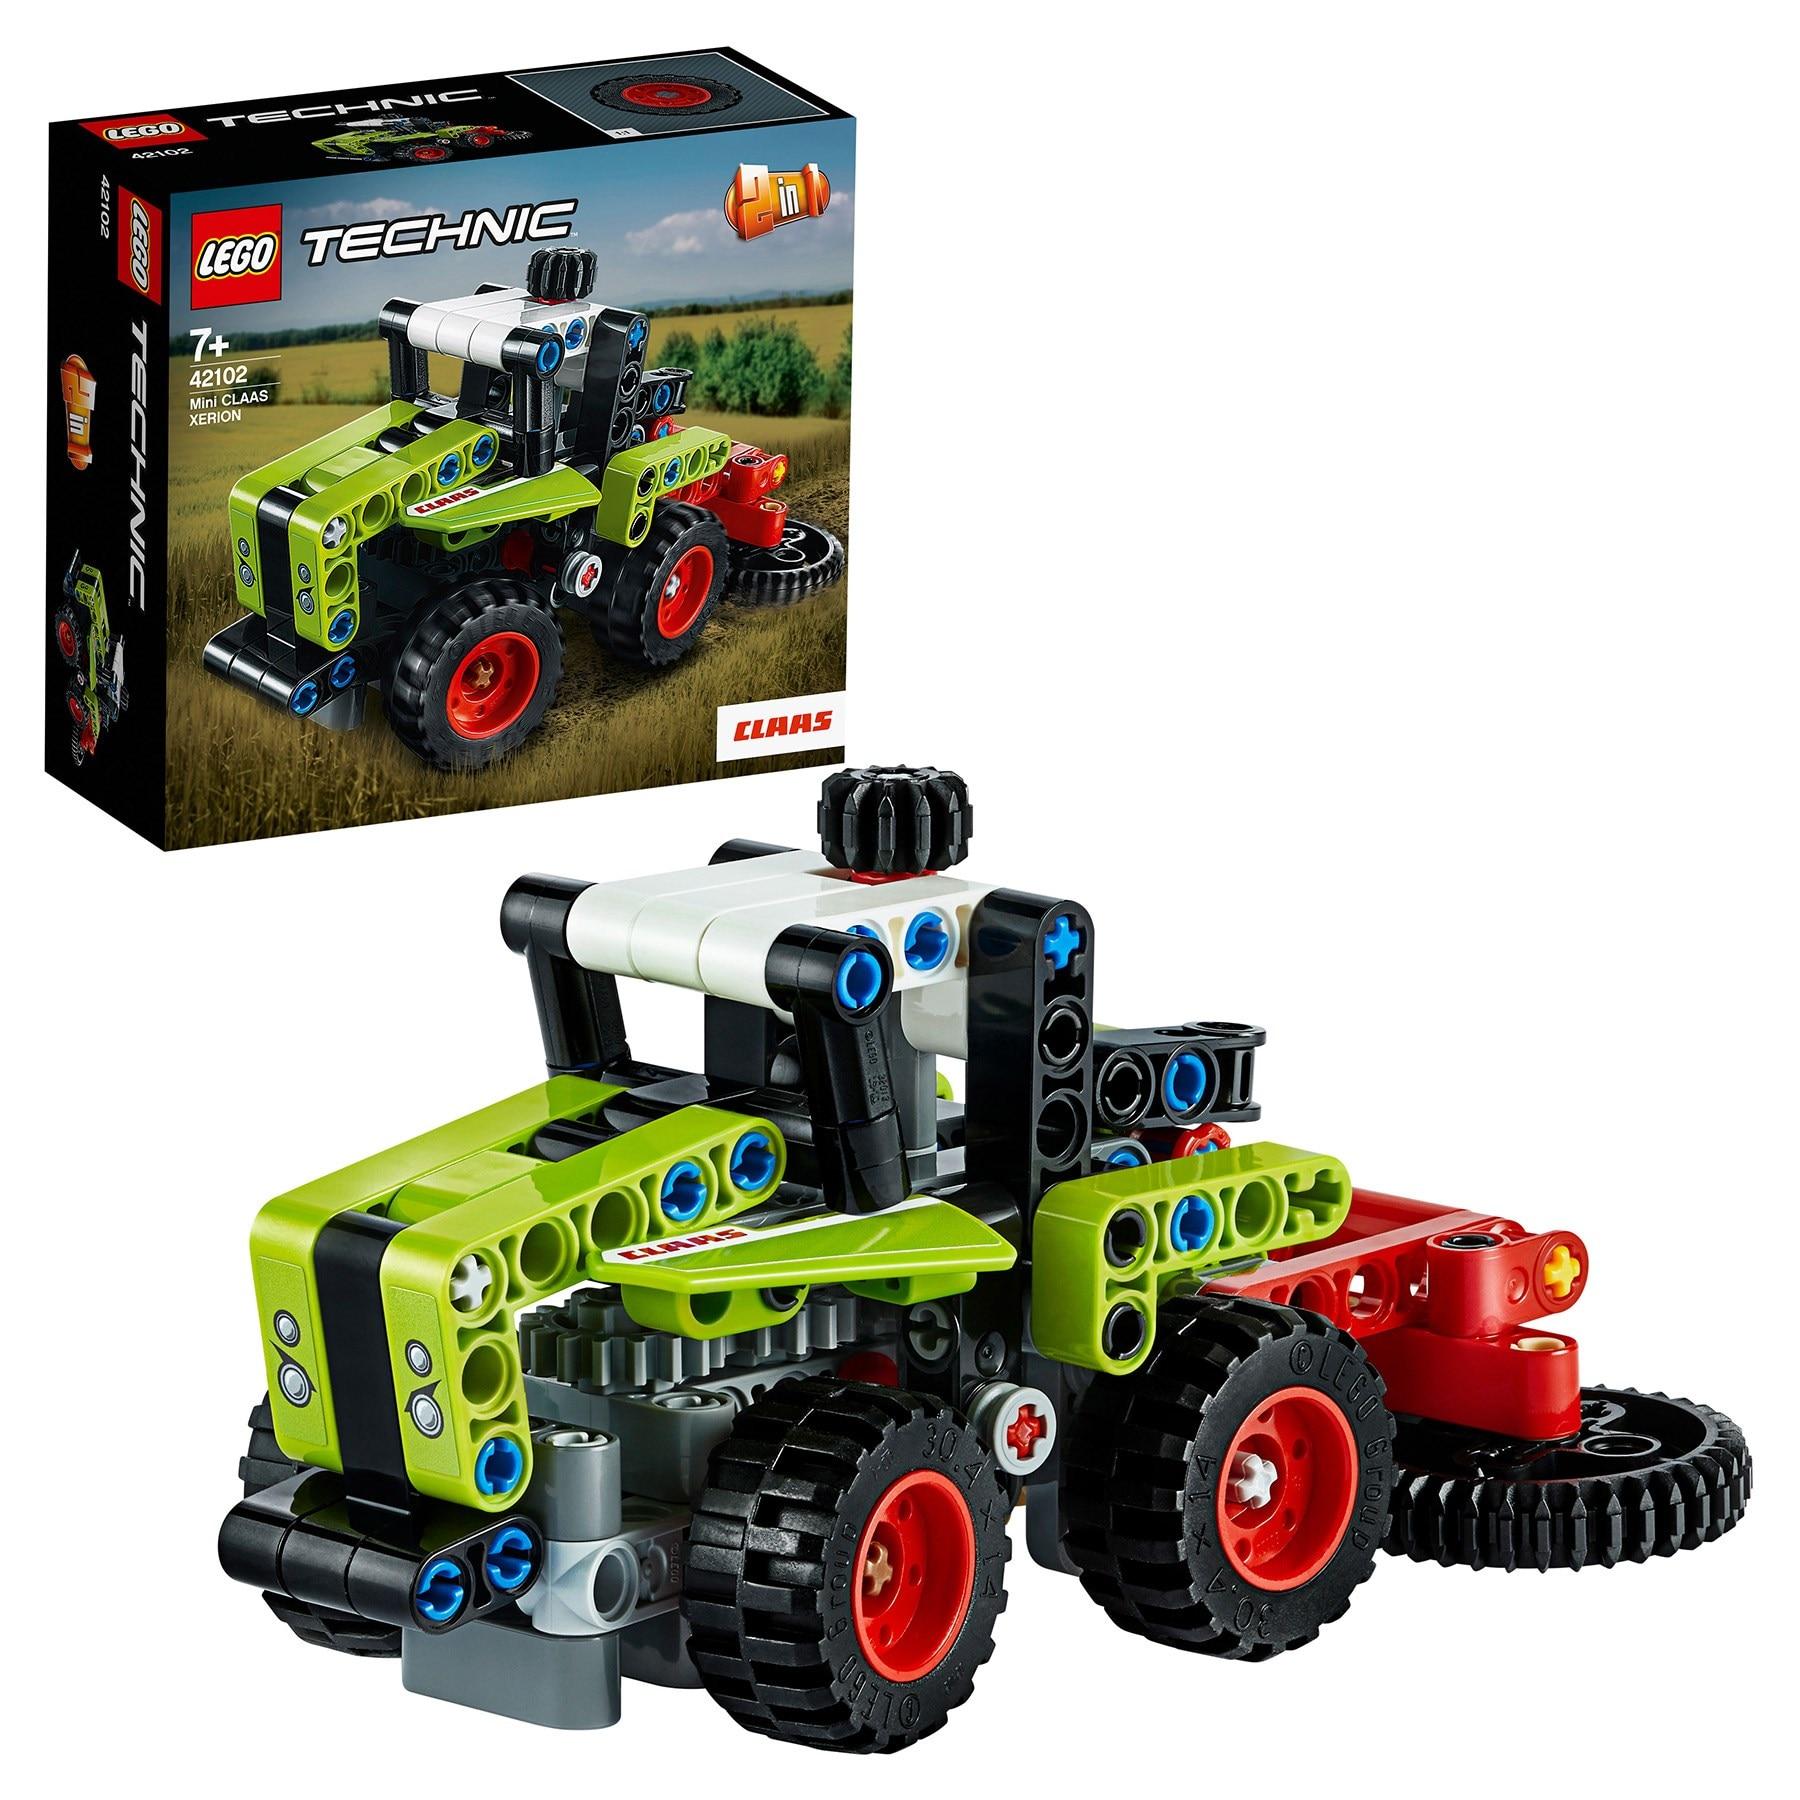 Designer Lego Technic 42102 Mini Claas Xerion